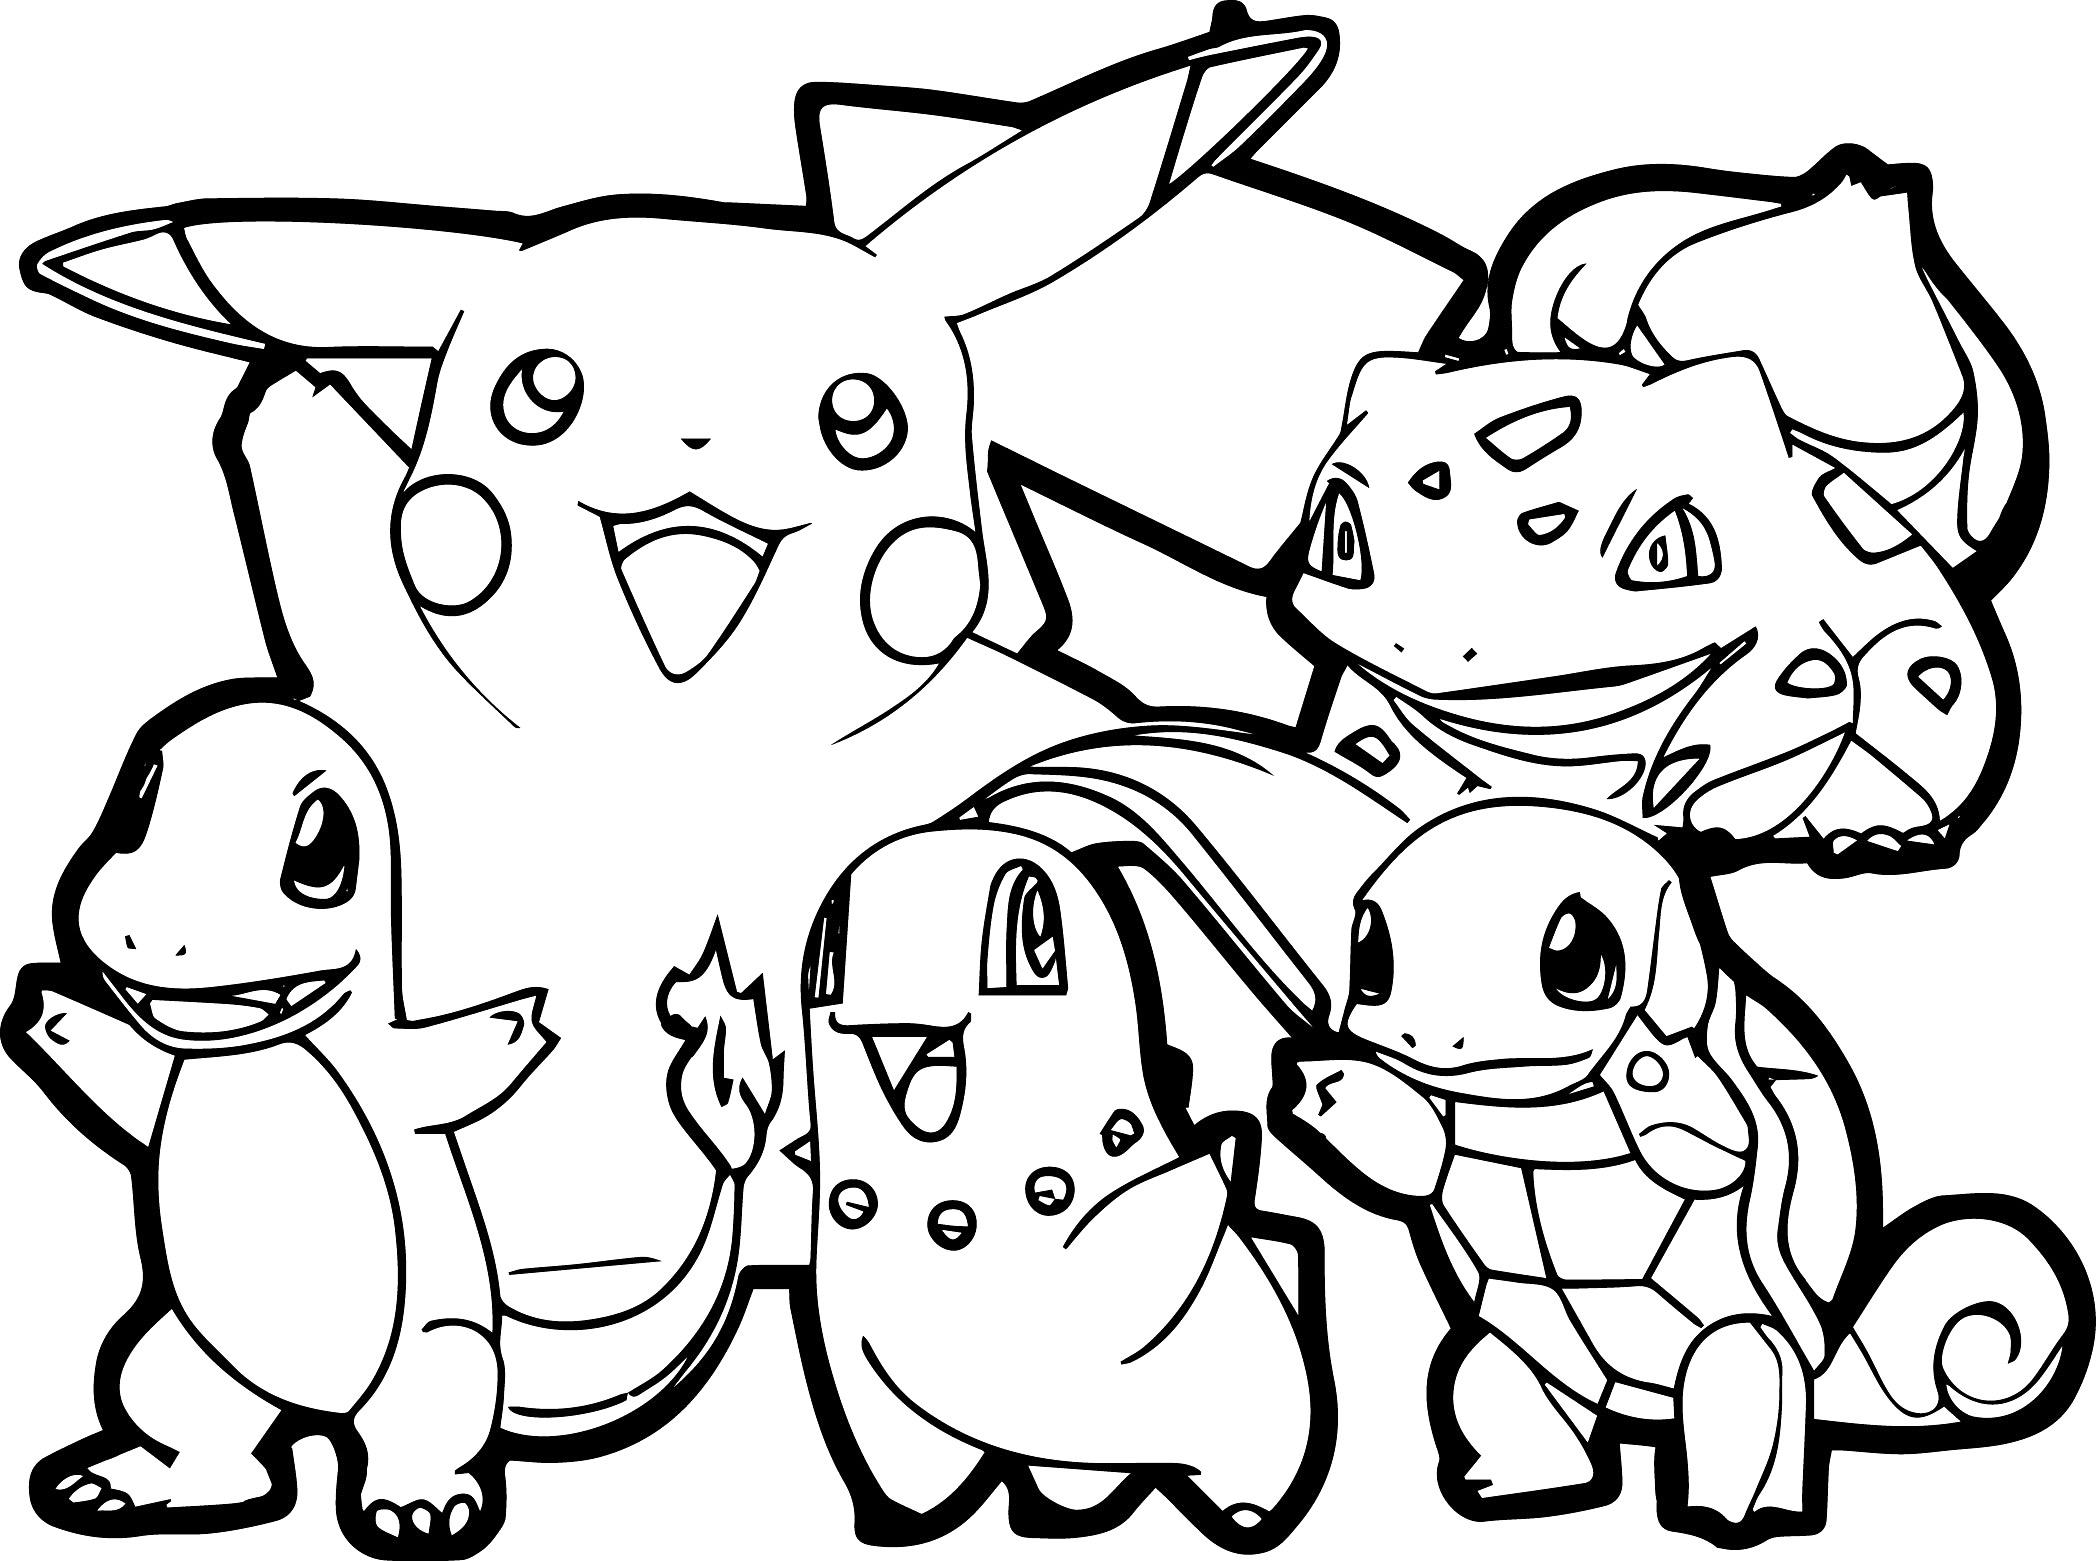 2096x1561 Pokecrew Free Coloring Page Kids Pokemon Coloring Pages Pokemon